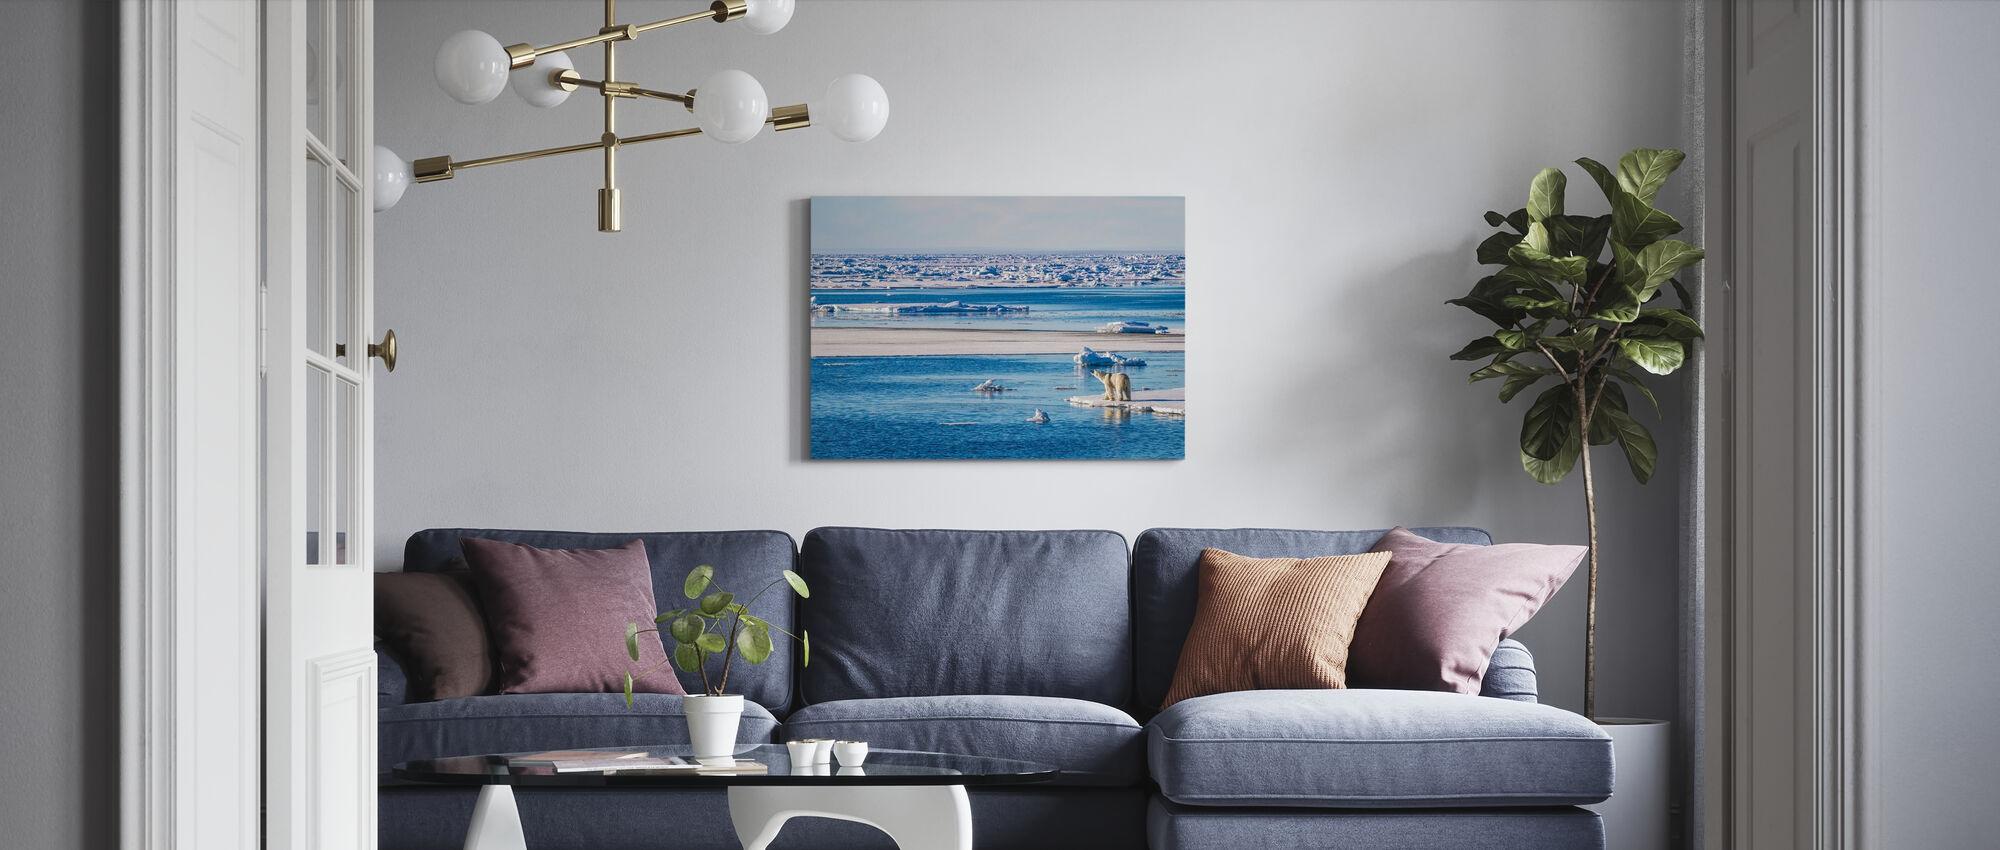 Uncertain Future - Canvas print - Living Room